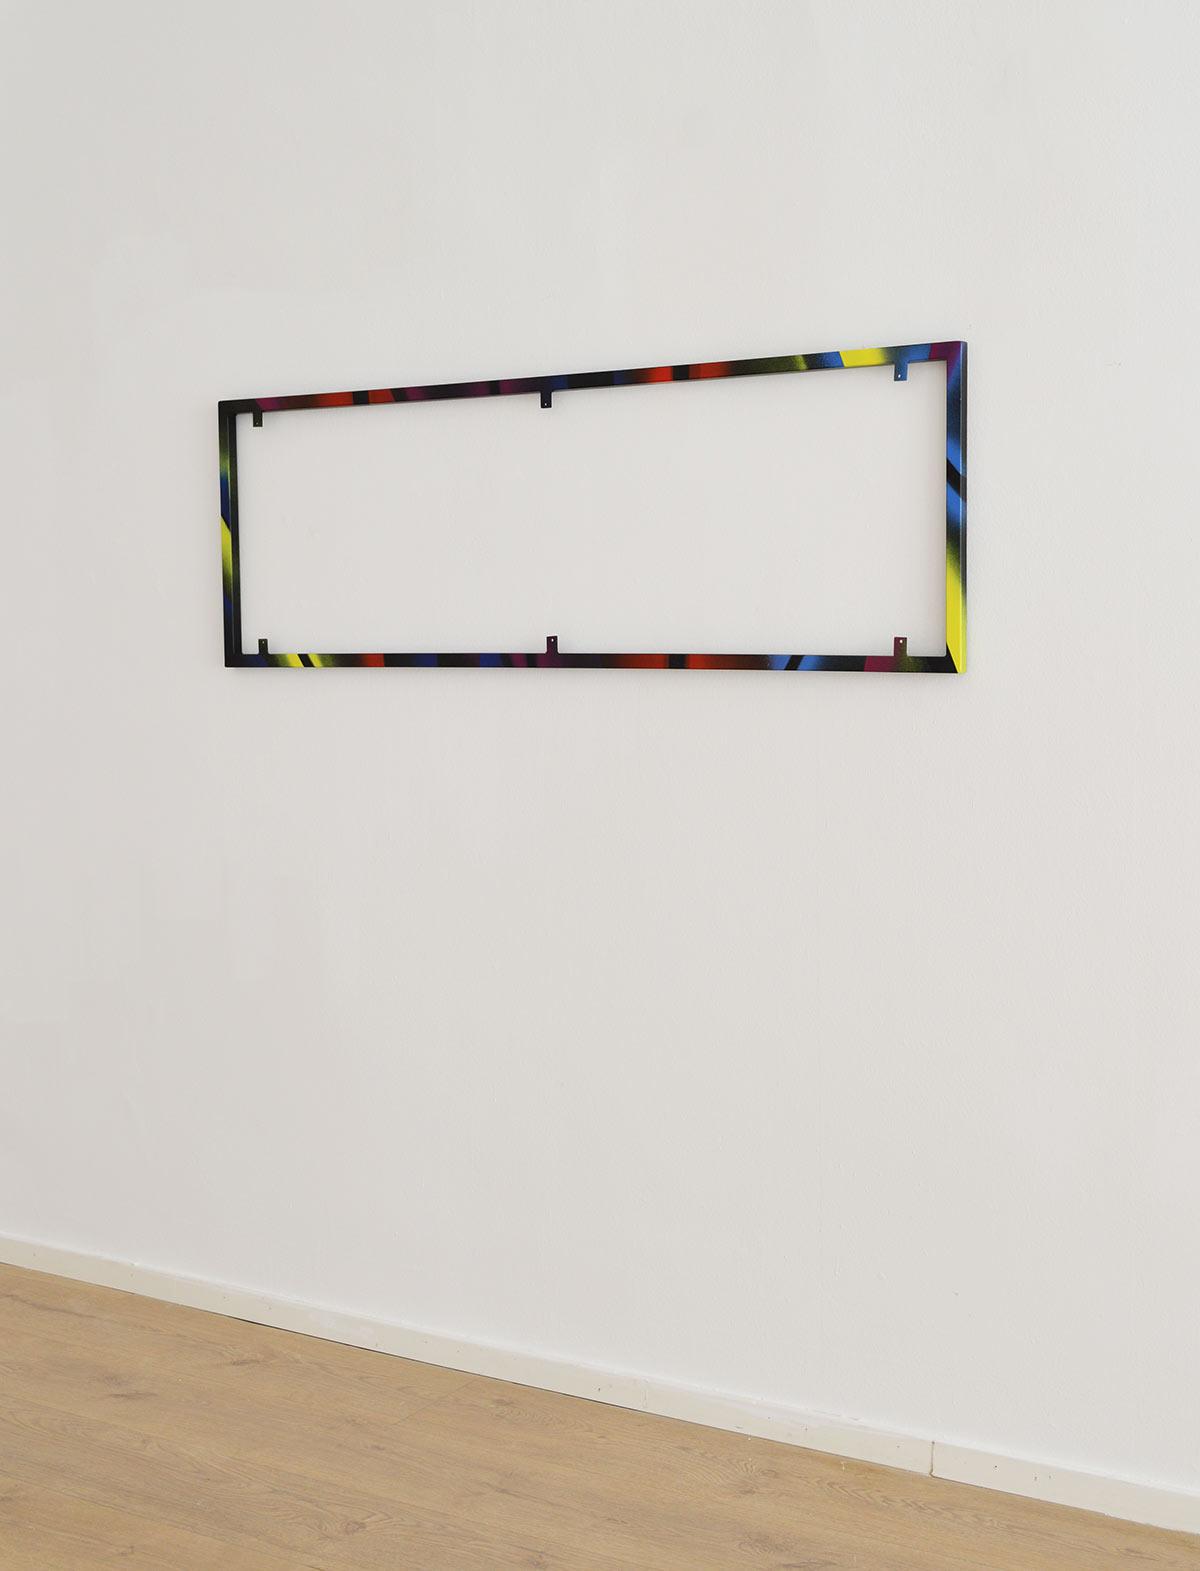 functionality, metal, concept art, vienna, 2021, desiderio gallery, new, vienna, 2021